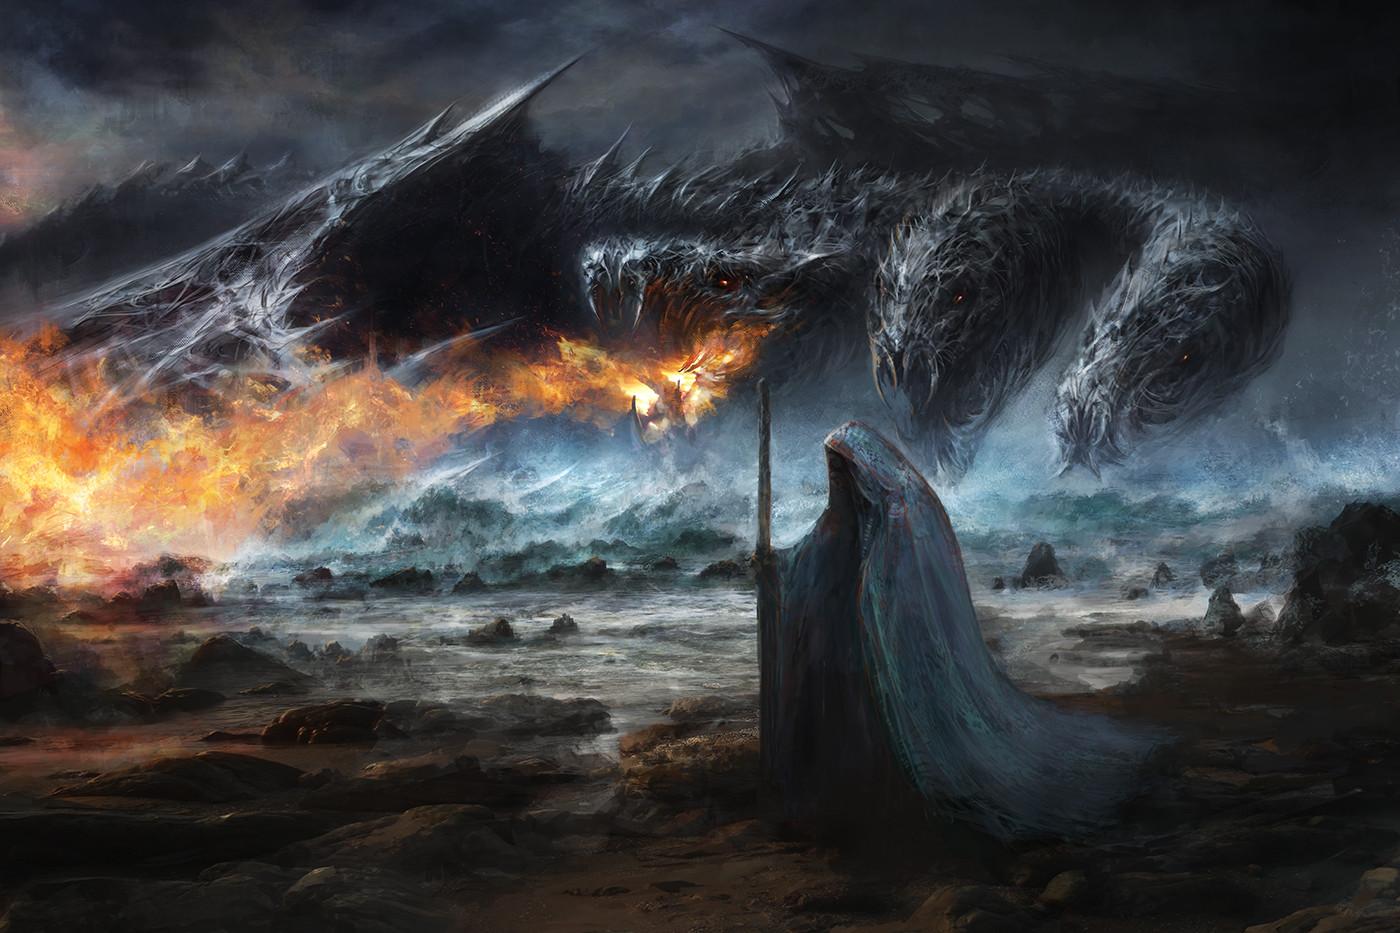 Chris cold dragon res